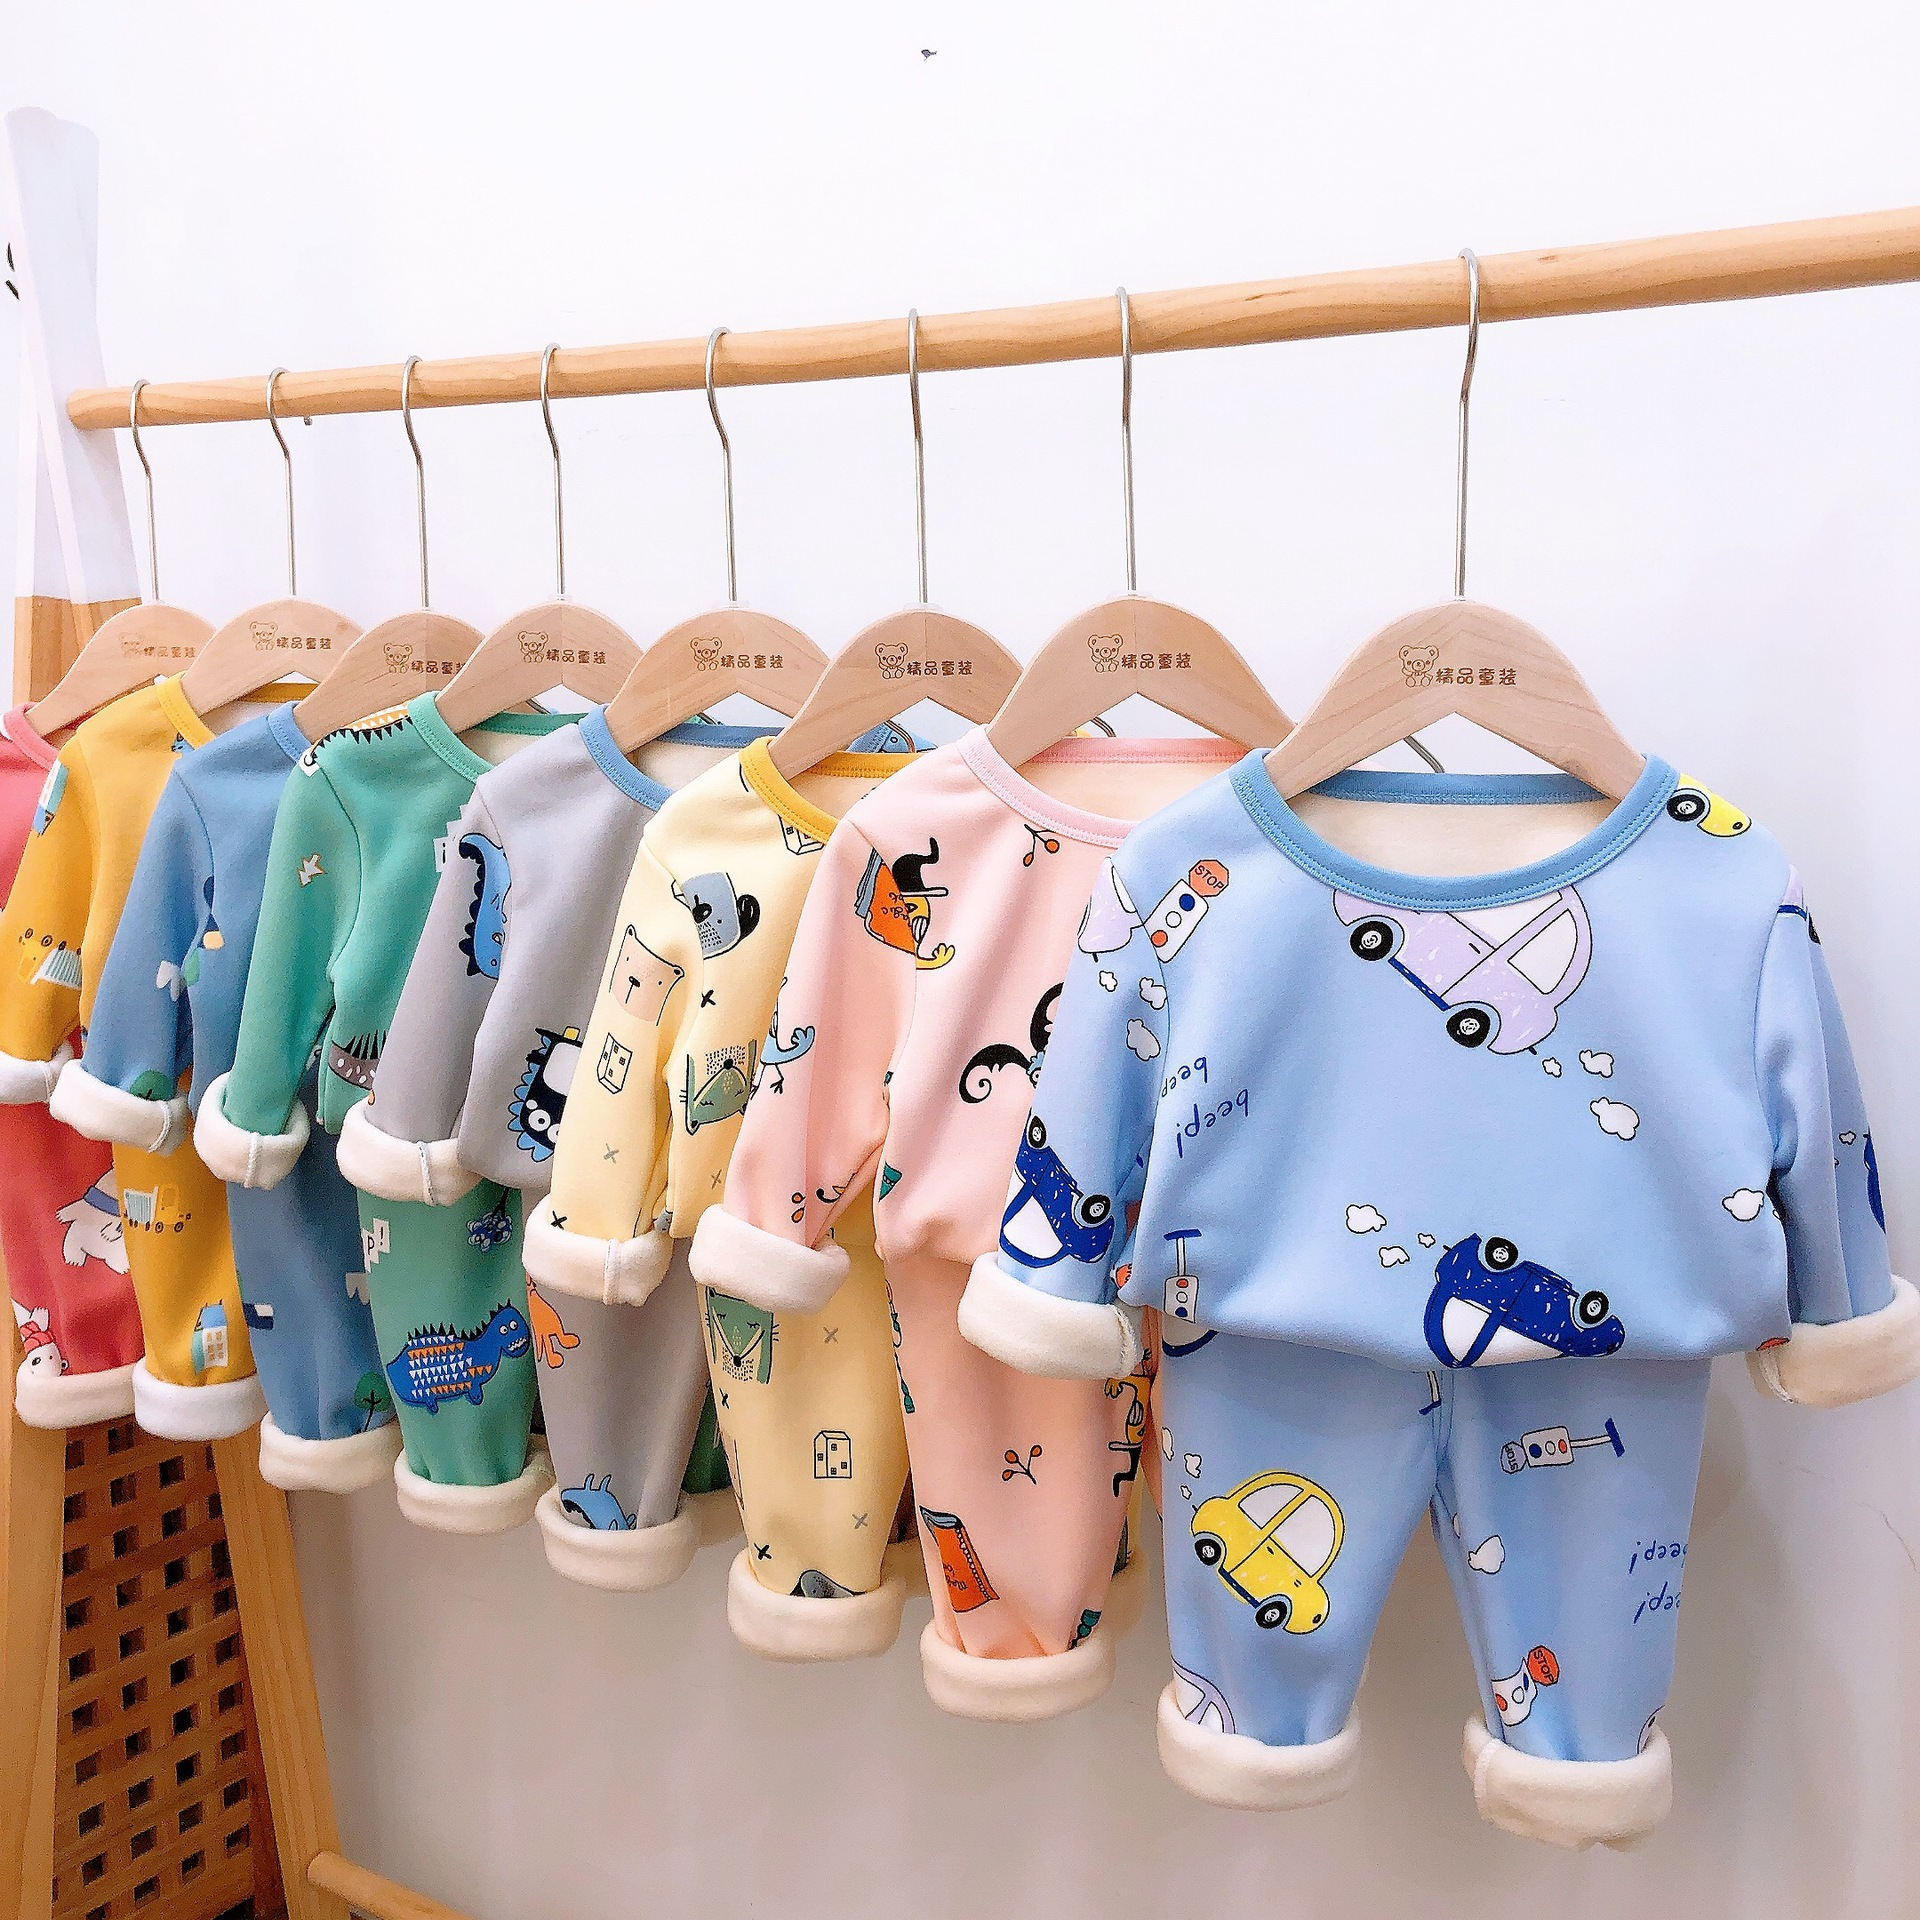 2020 Autumn Winter Thicken Velvet Children Pajamas Cartoon Family Boys Girls Clothing Set Kids Casual Sleepwear Suits Clothes 2